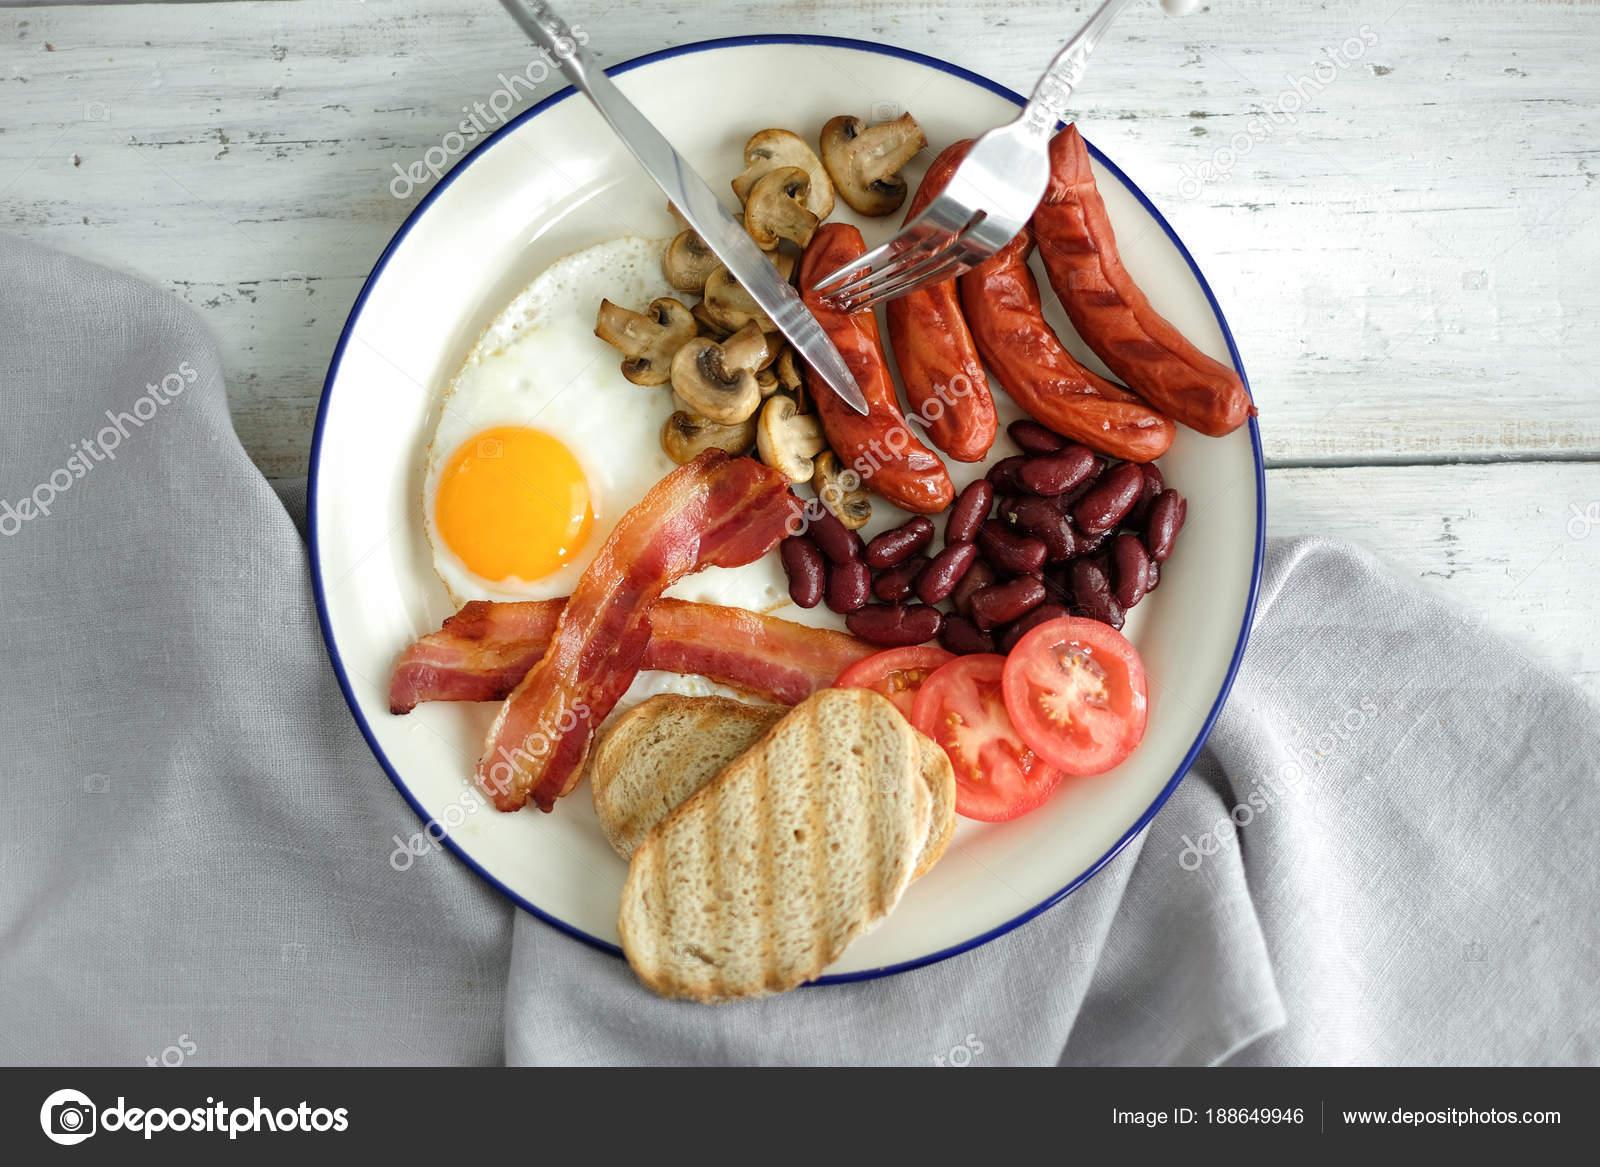 Cibo Cucina Colazione Inglese Zolla Bianca Uova Pancetta Salsicce ...